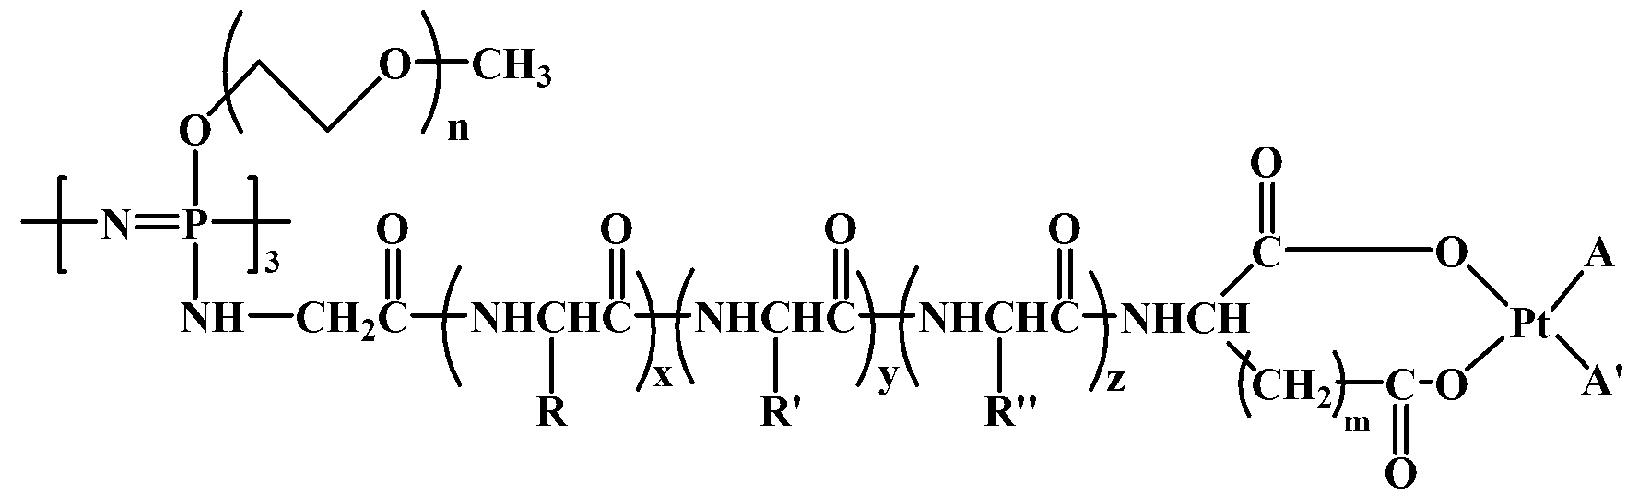 Table Salt Chemical Formula Chemical formula 3: